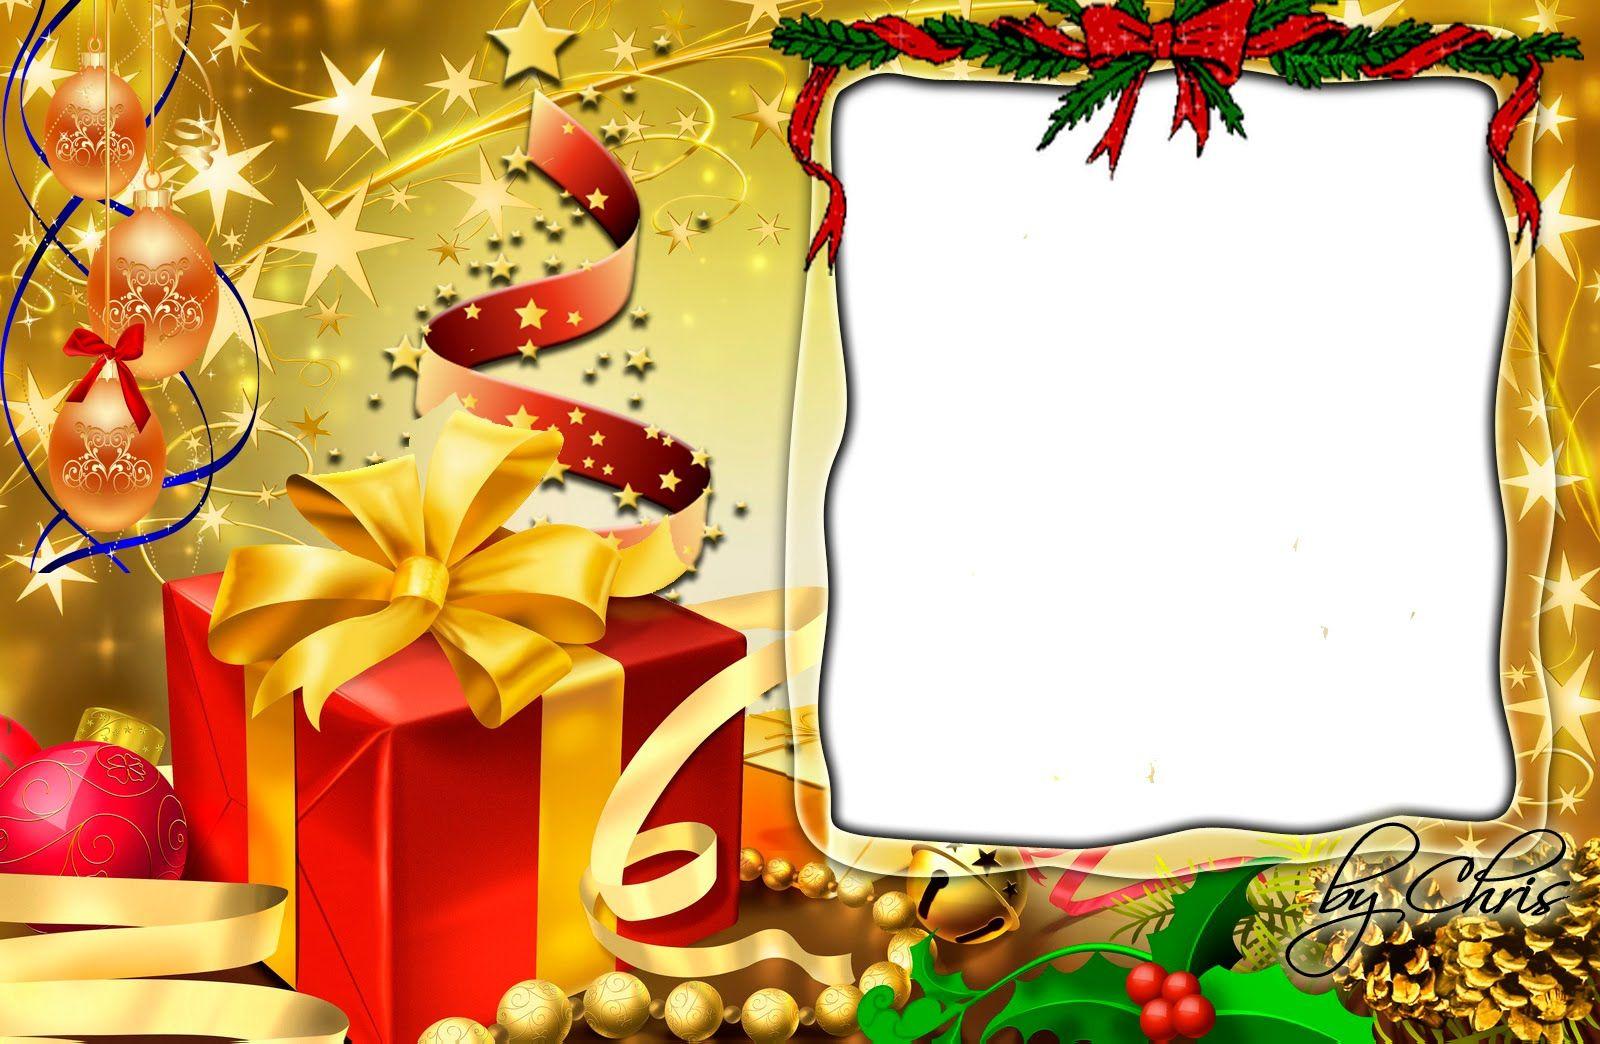 Cartoes De Natal Gratis Para Imprimir Lindas Mensagens Pra